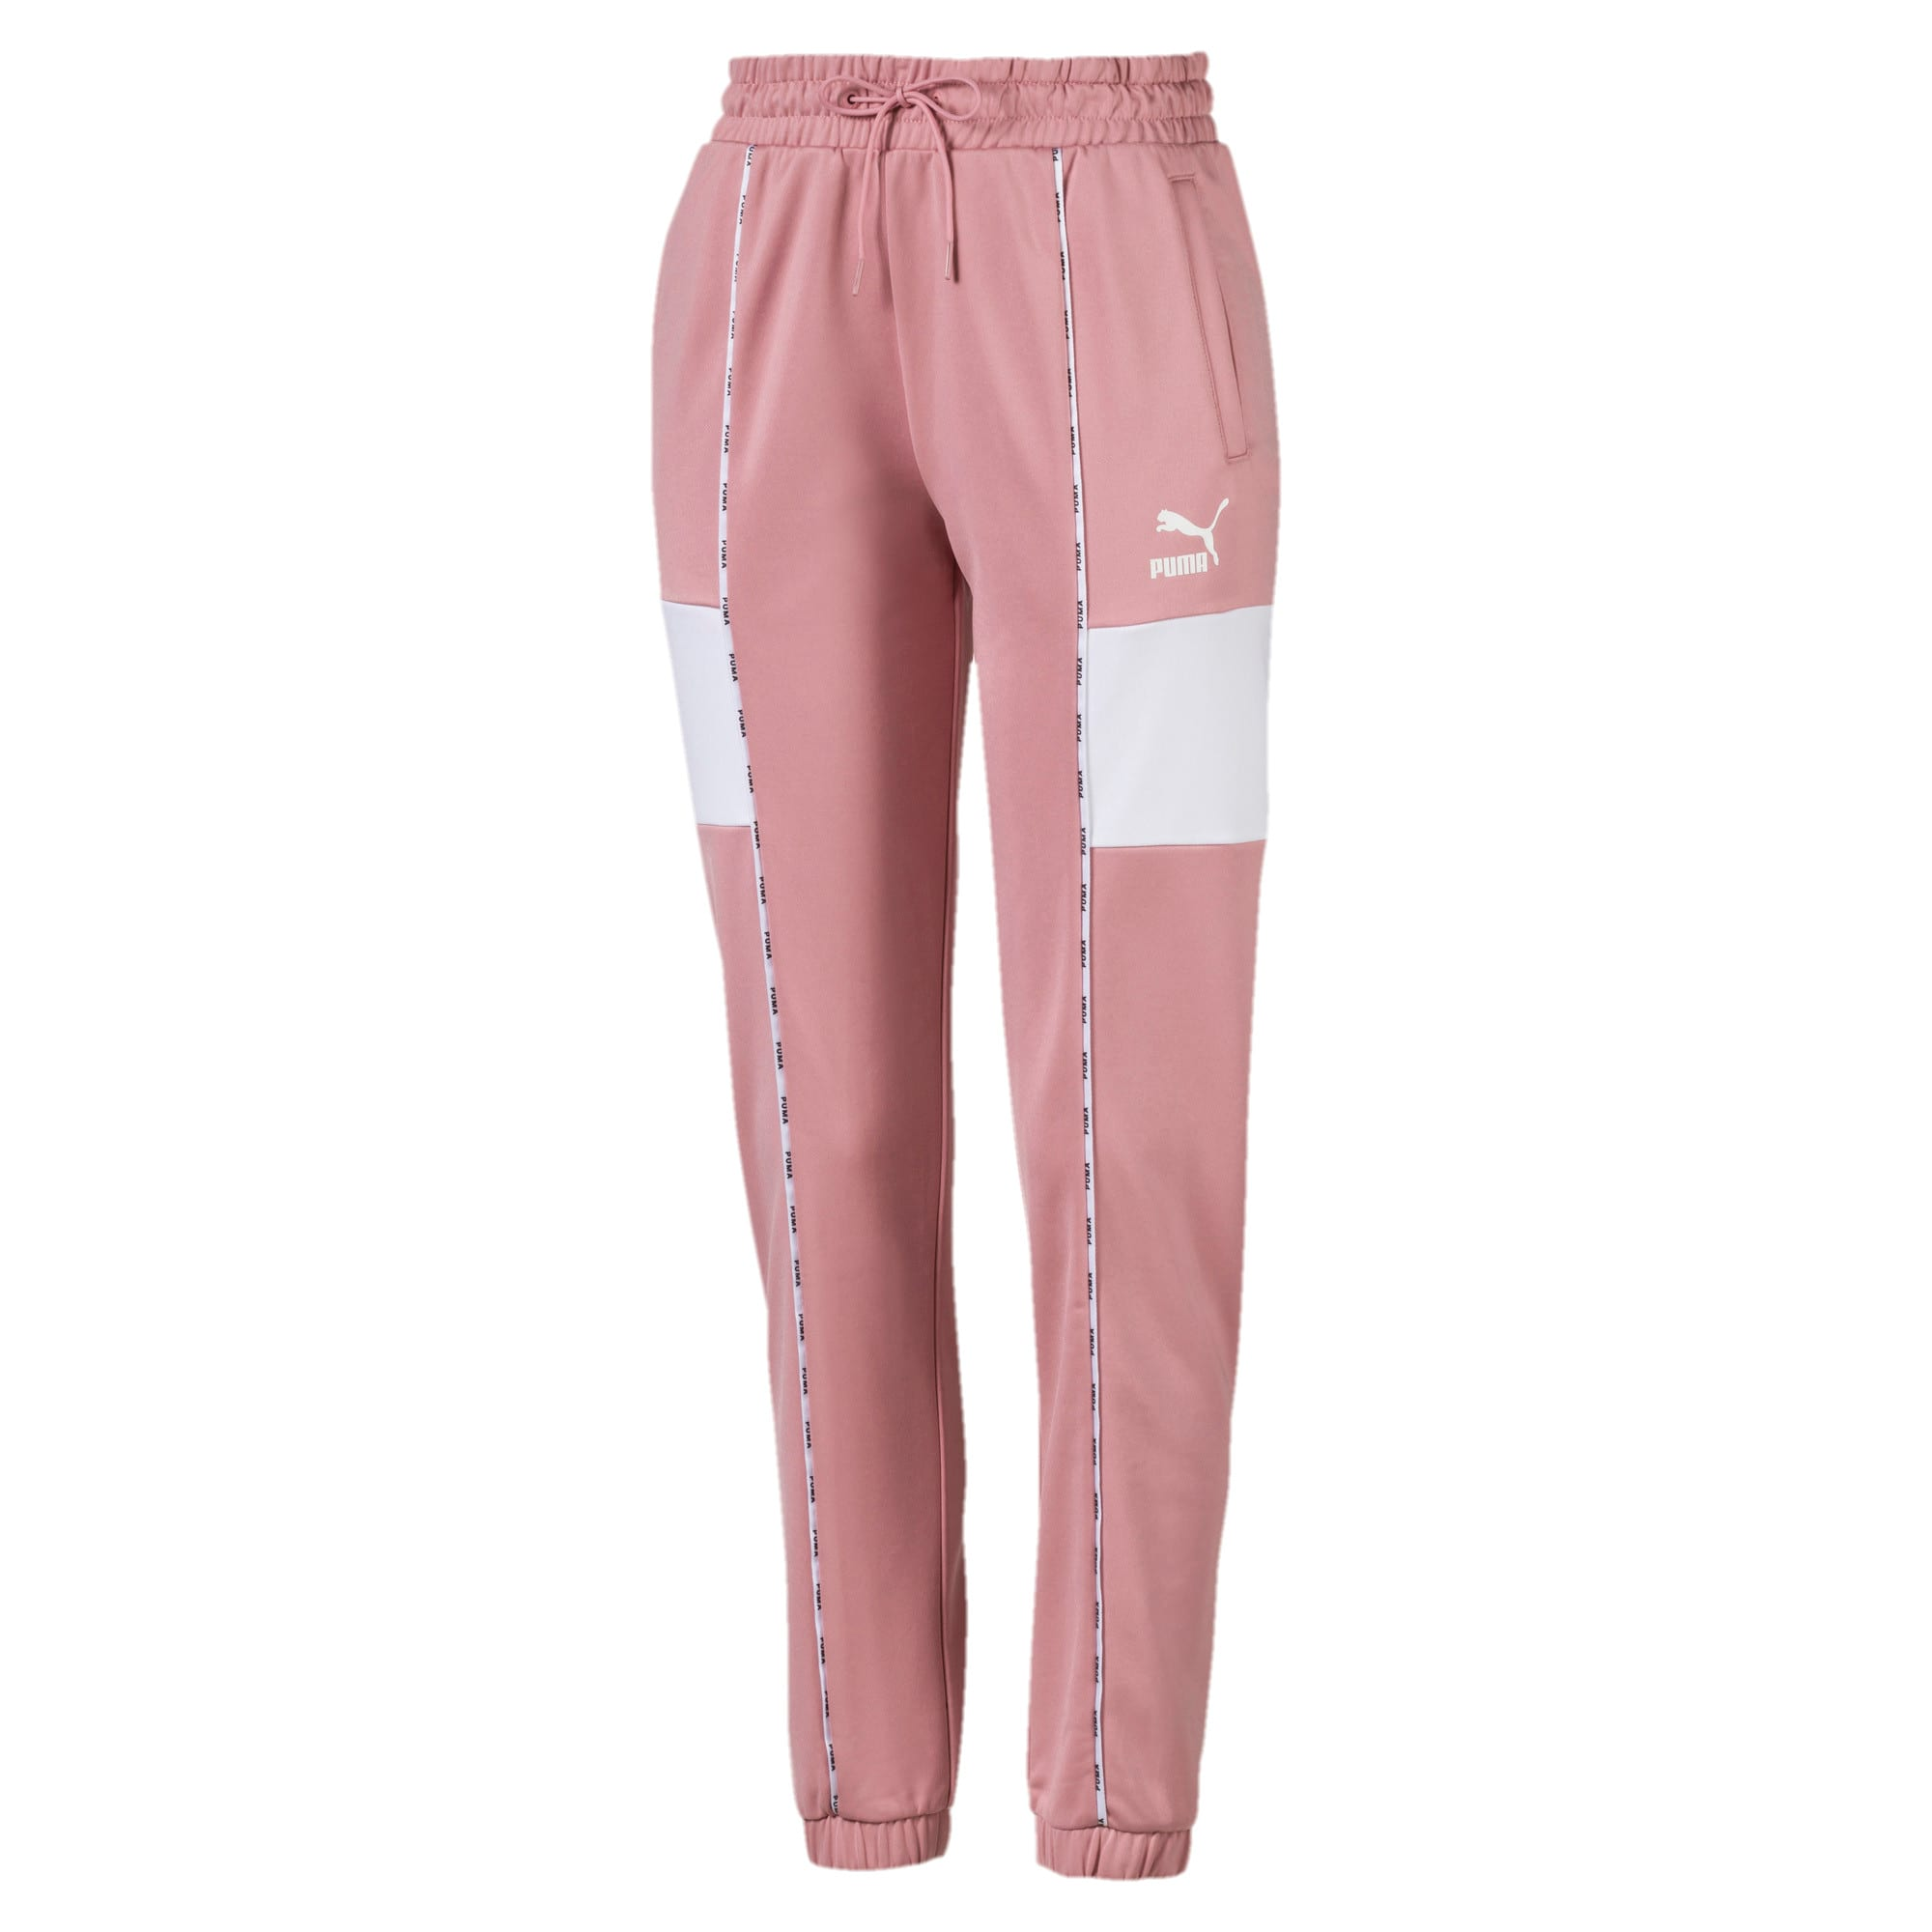 Miniatura 1 de Pantalones deportivos PUMA XTG para mujer, Bridal Rose, mediano